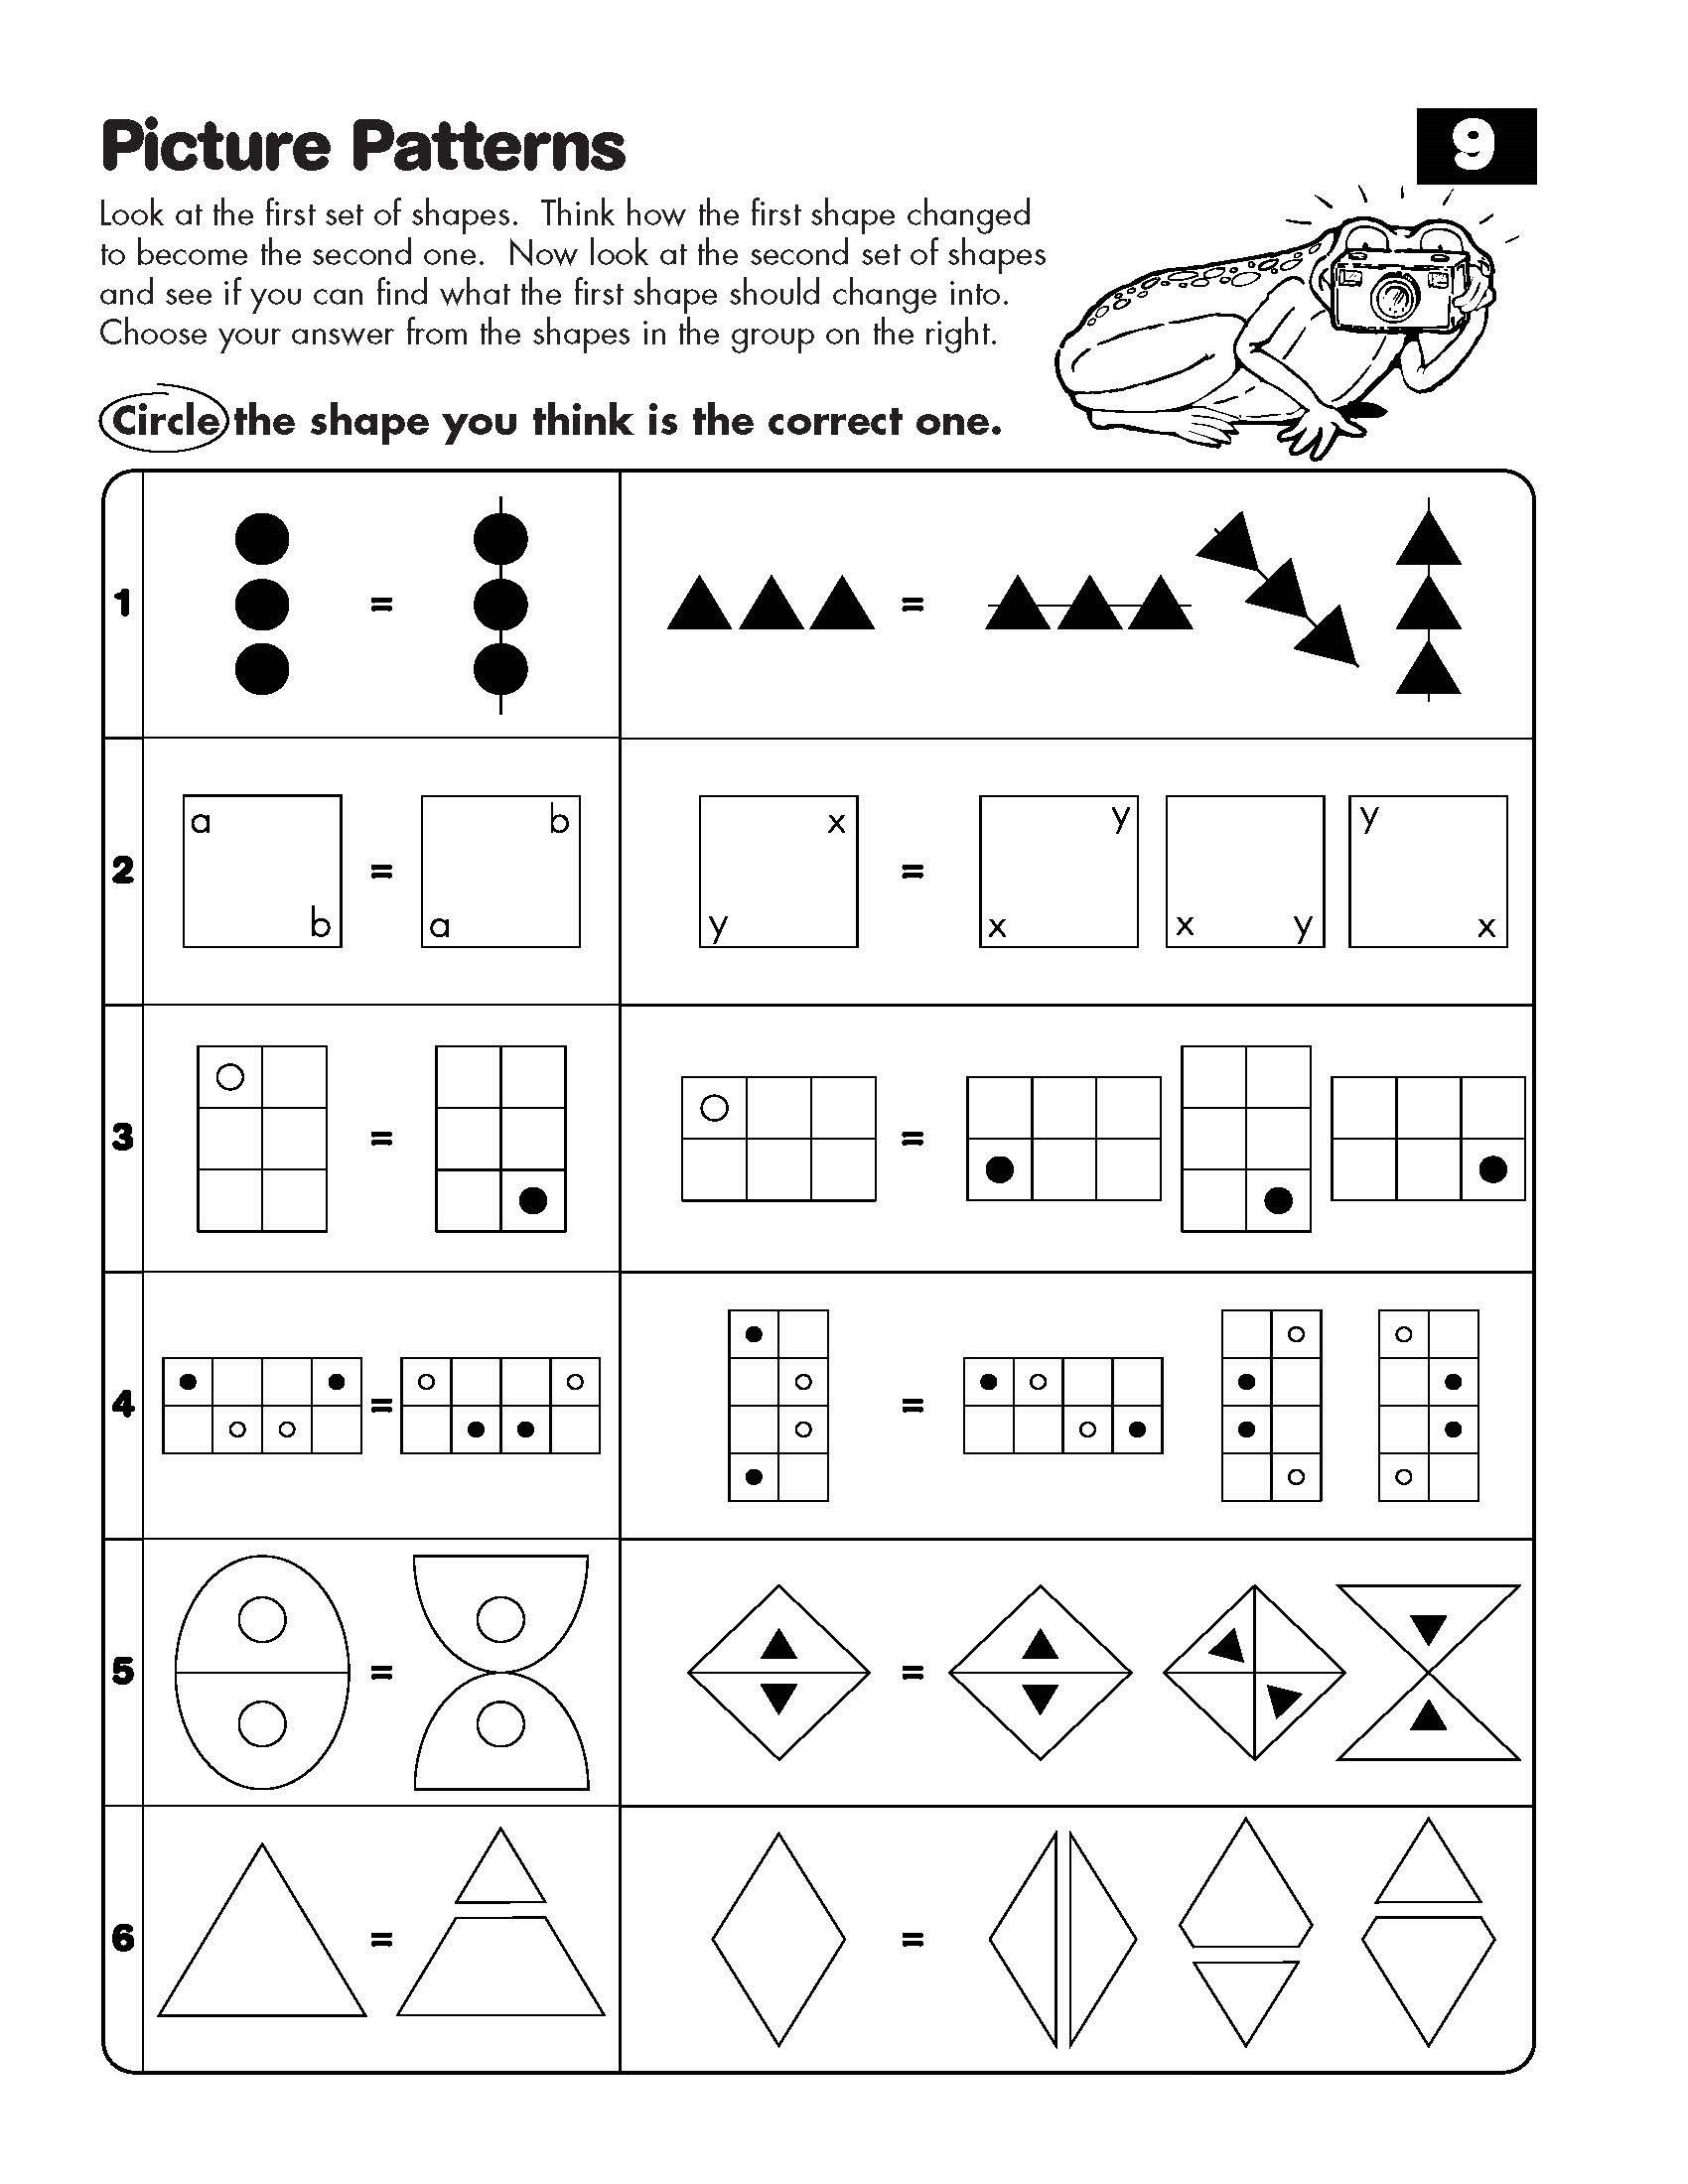 4 Math Making Change Worksheets In 2020 Pattern Worksheet Learn Math Online Pattern Worksheets For Kindergarten